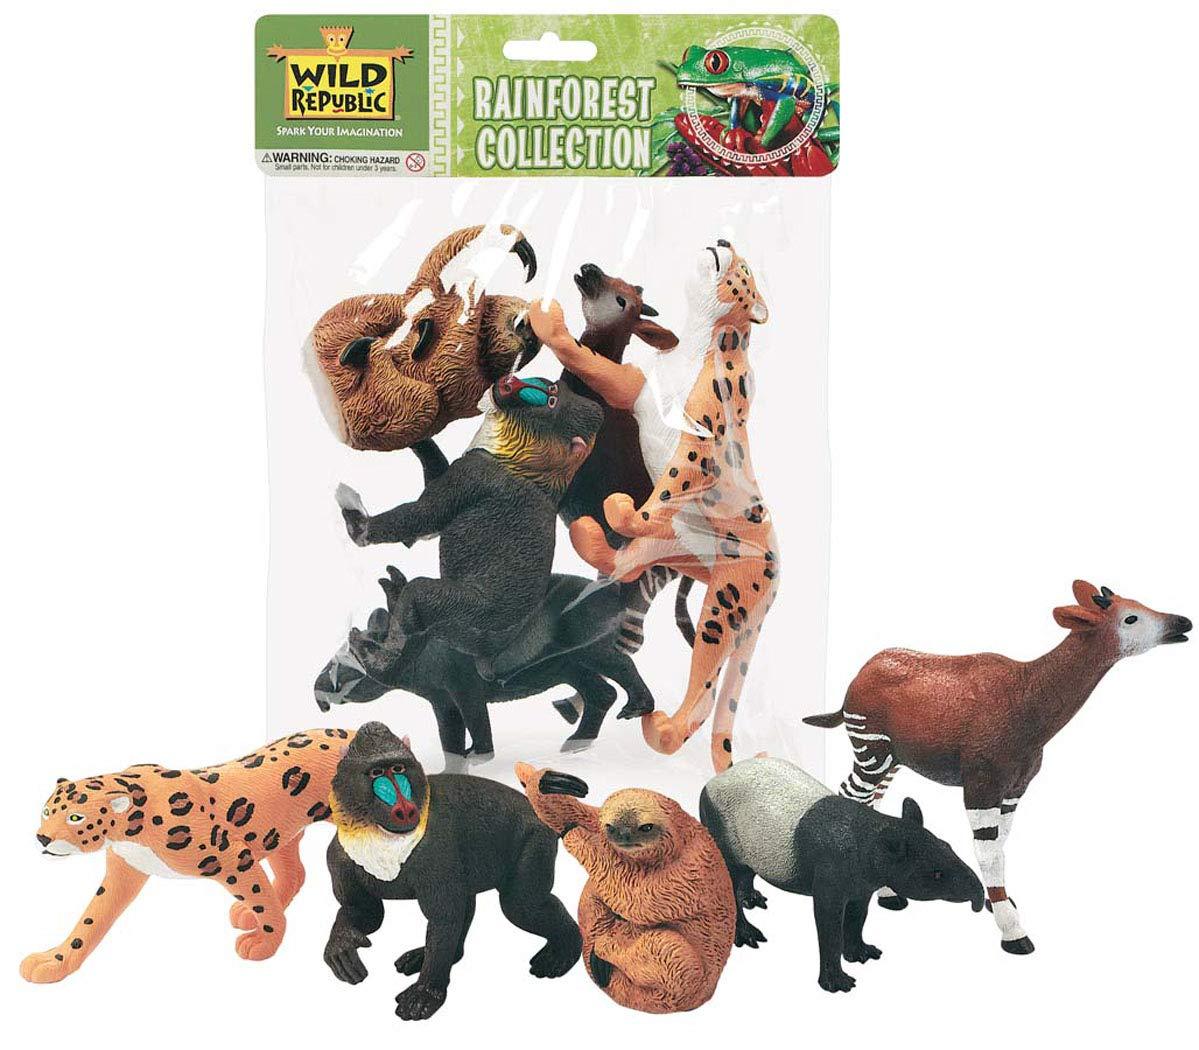 Wild Republic 53529 Tüte mit Tiersammlung, Regenwald, 5 Figuren, bunt